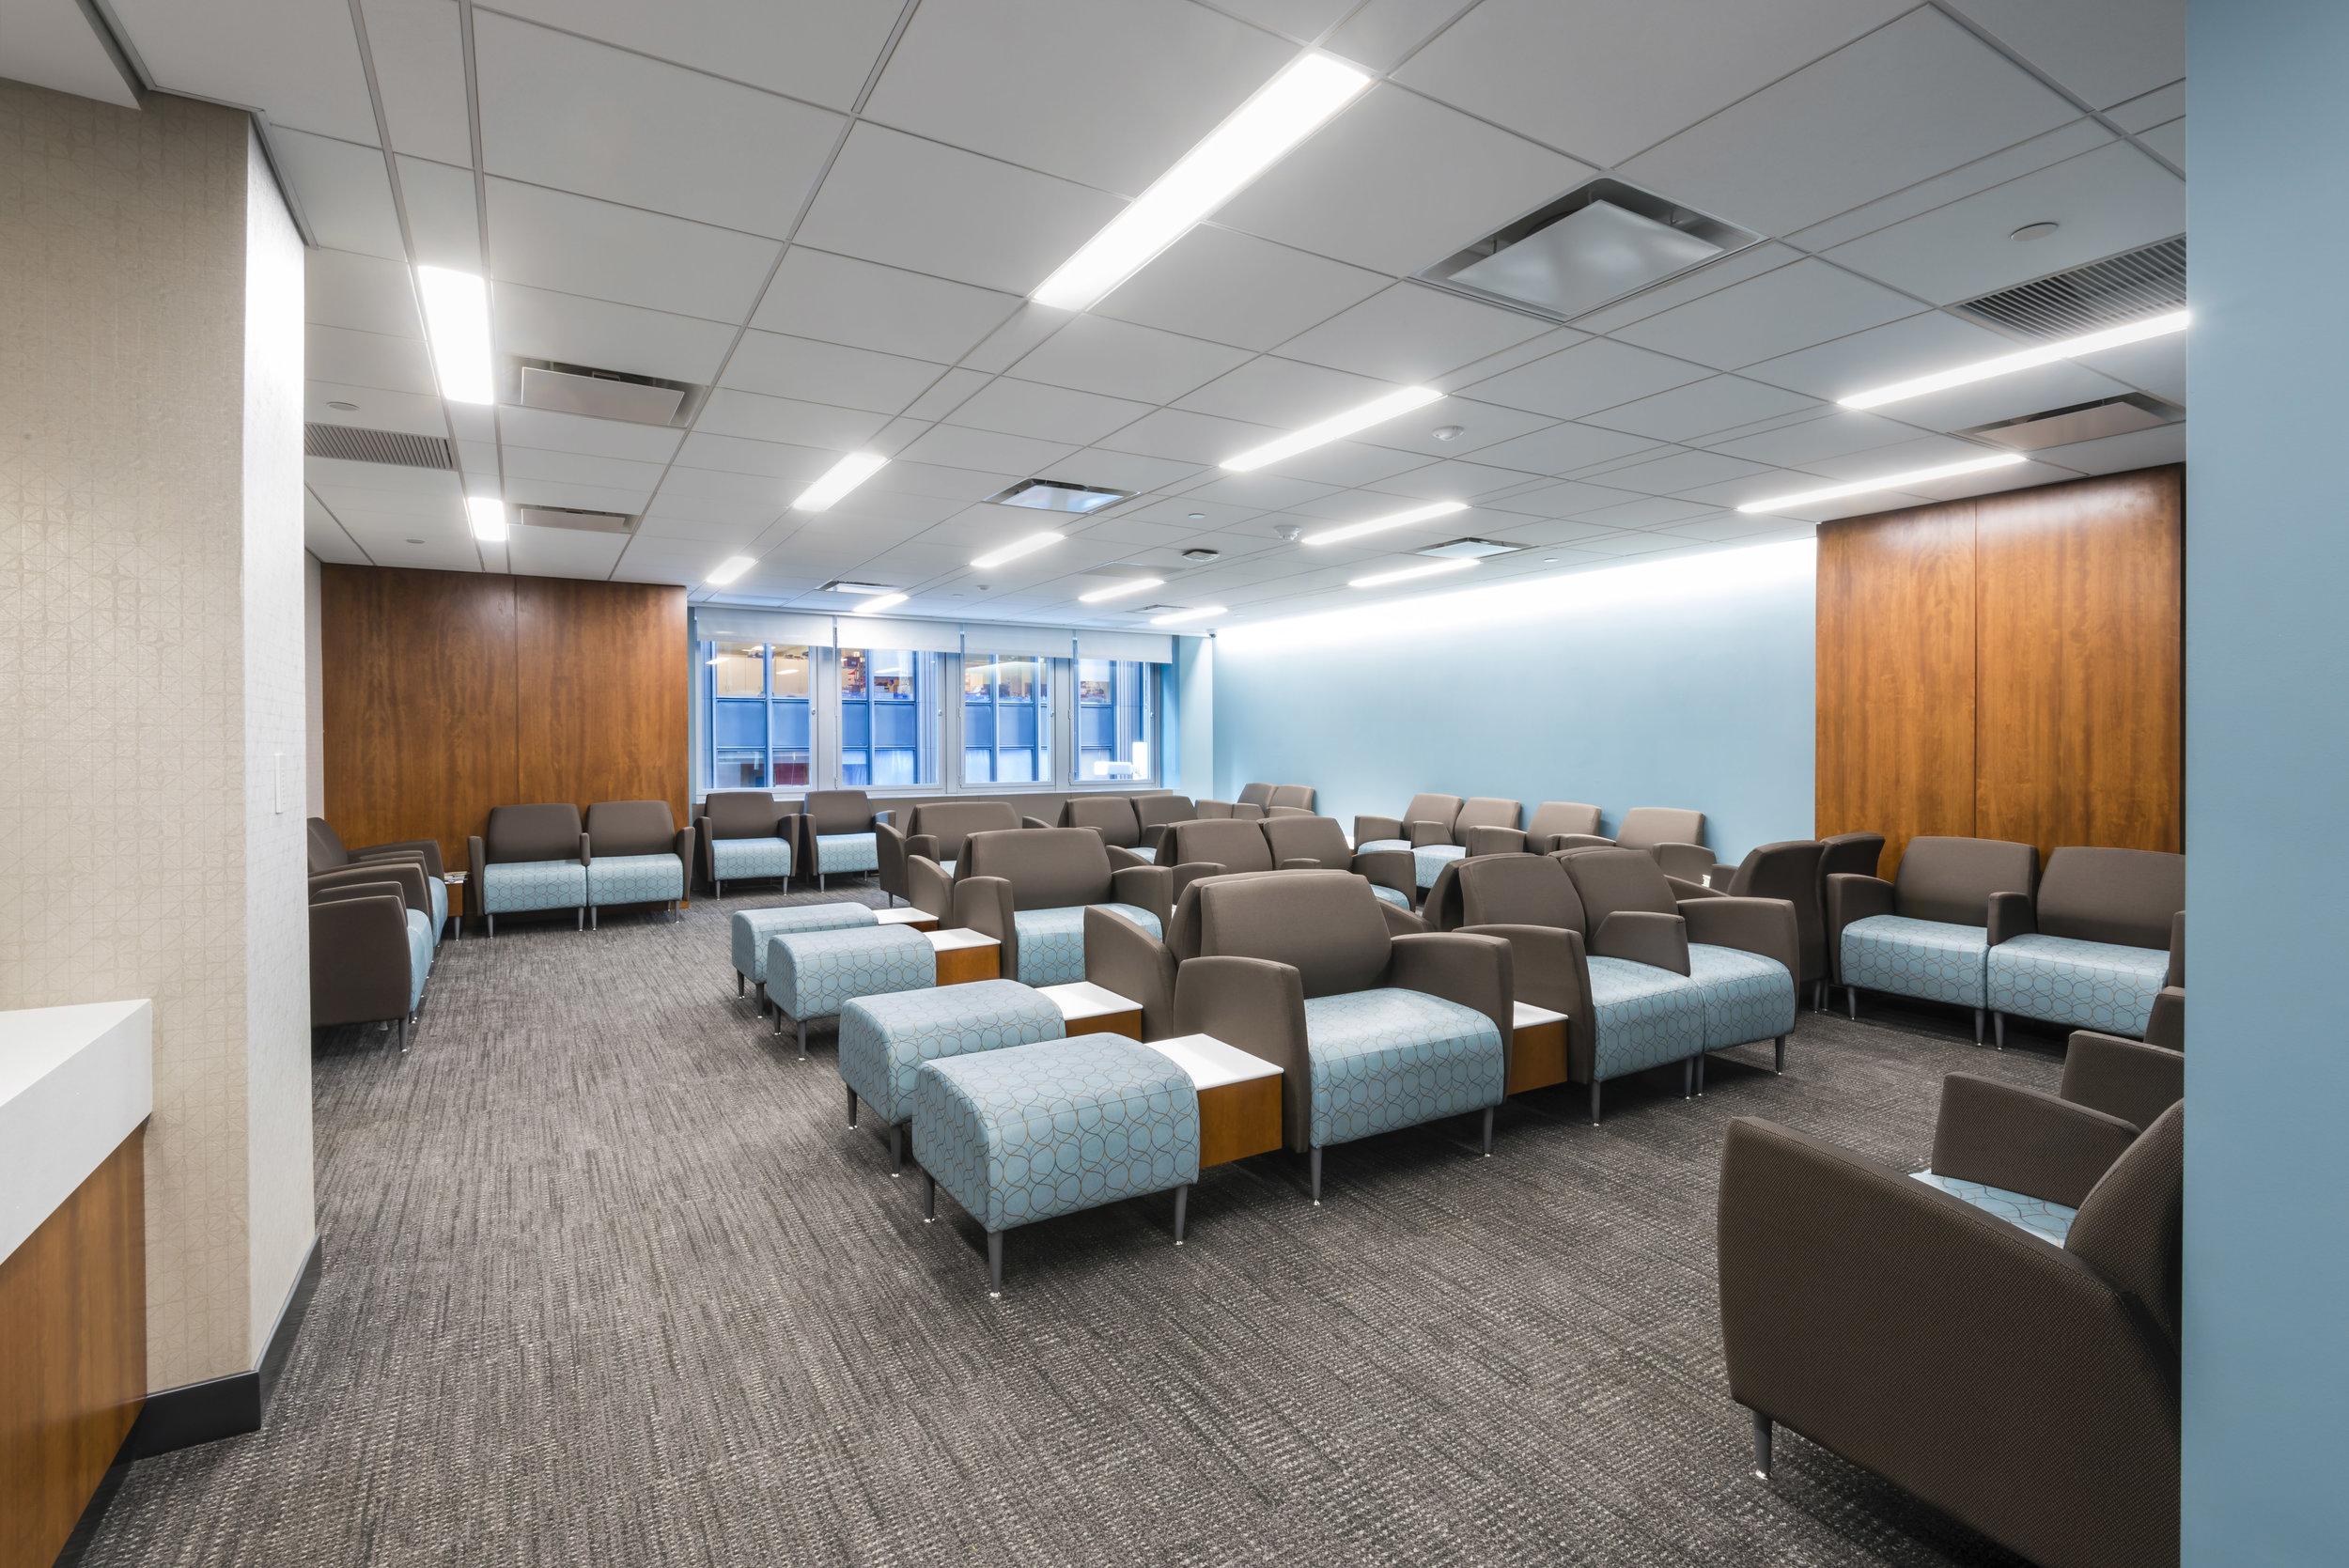 DOCTORS PRACTICE - NYP / COLUMBIA UNIVERSITY  MEDICAL CENTER